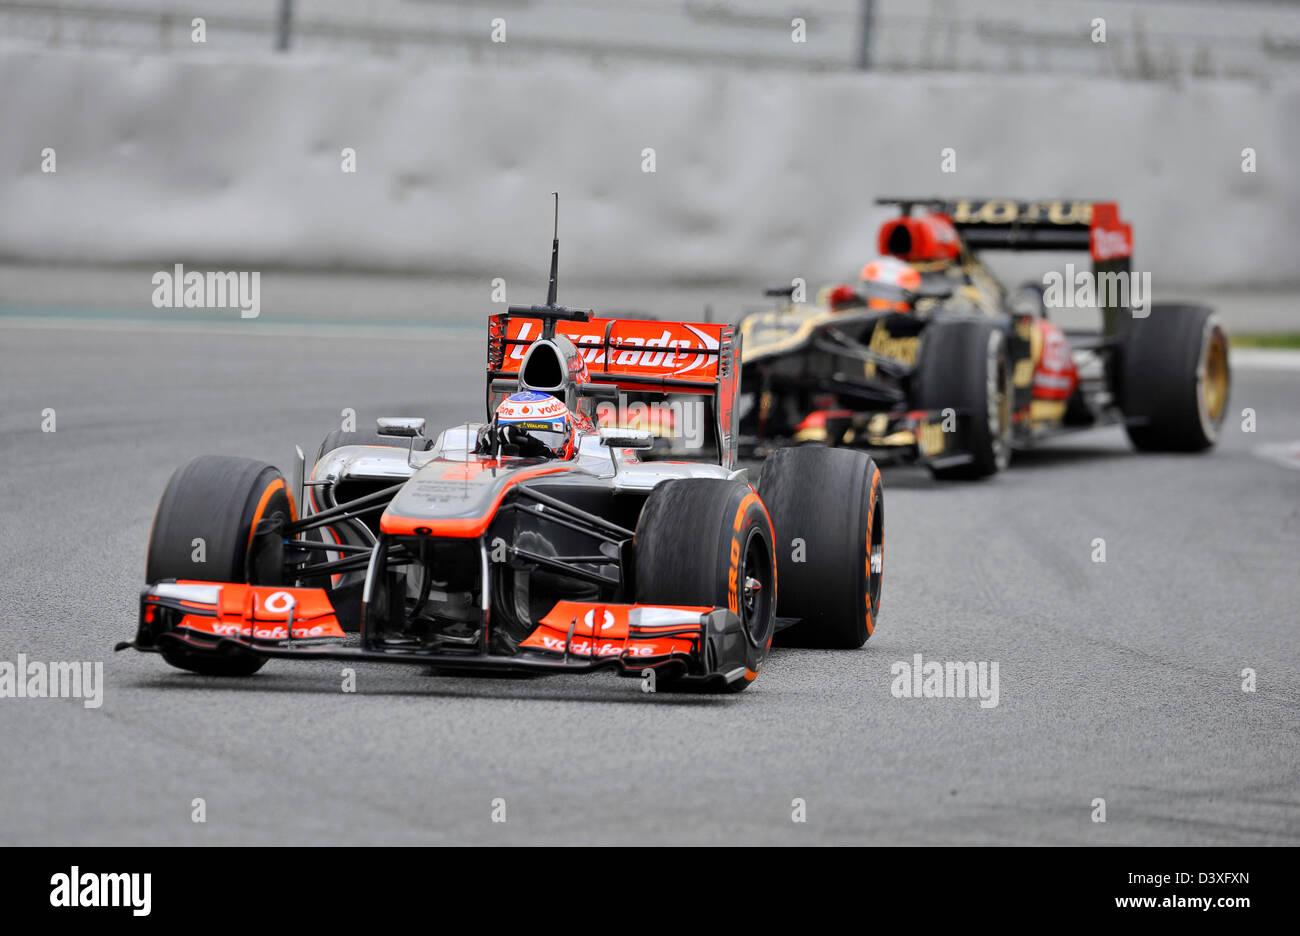 Jenson Button (GBR),McLaren Mercedes MP4-28 during Formula One tests on Circuit de Catalunya racetrack near Barcelona, - Stock Image